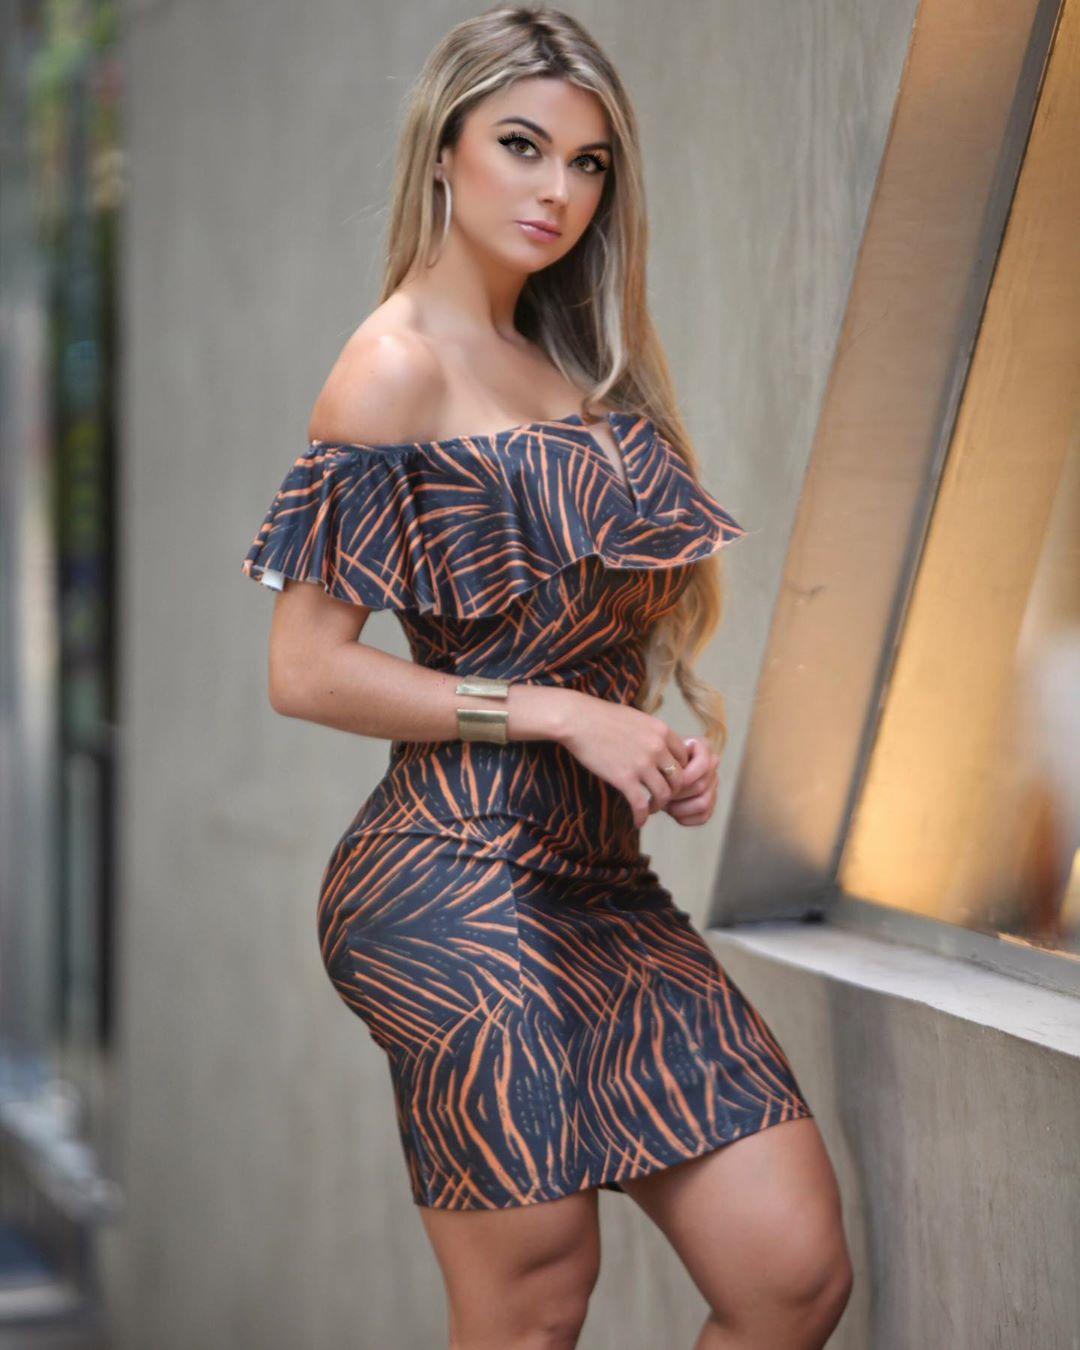 Amanda-Franca-Wallpapers-Insta-Fit-Bio-3